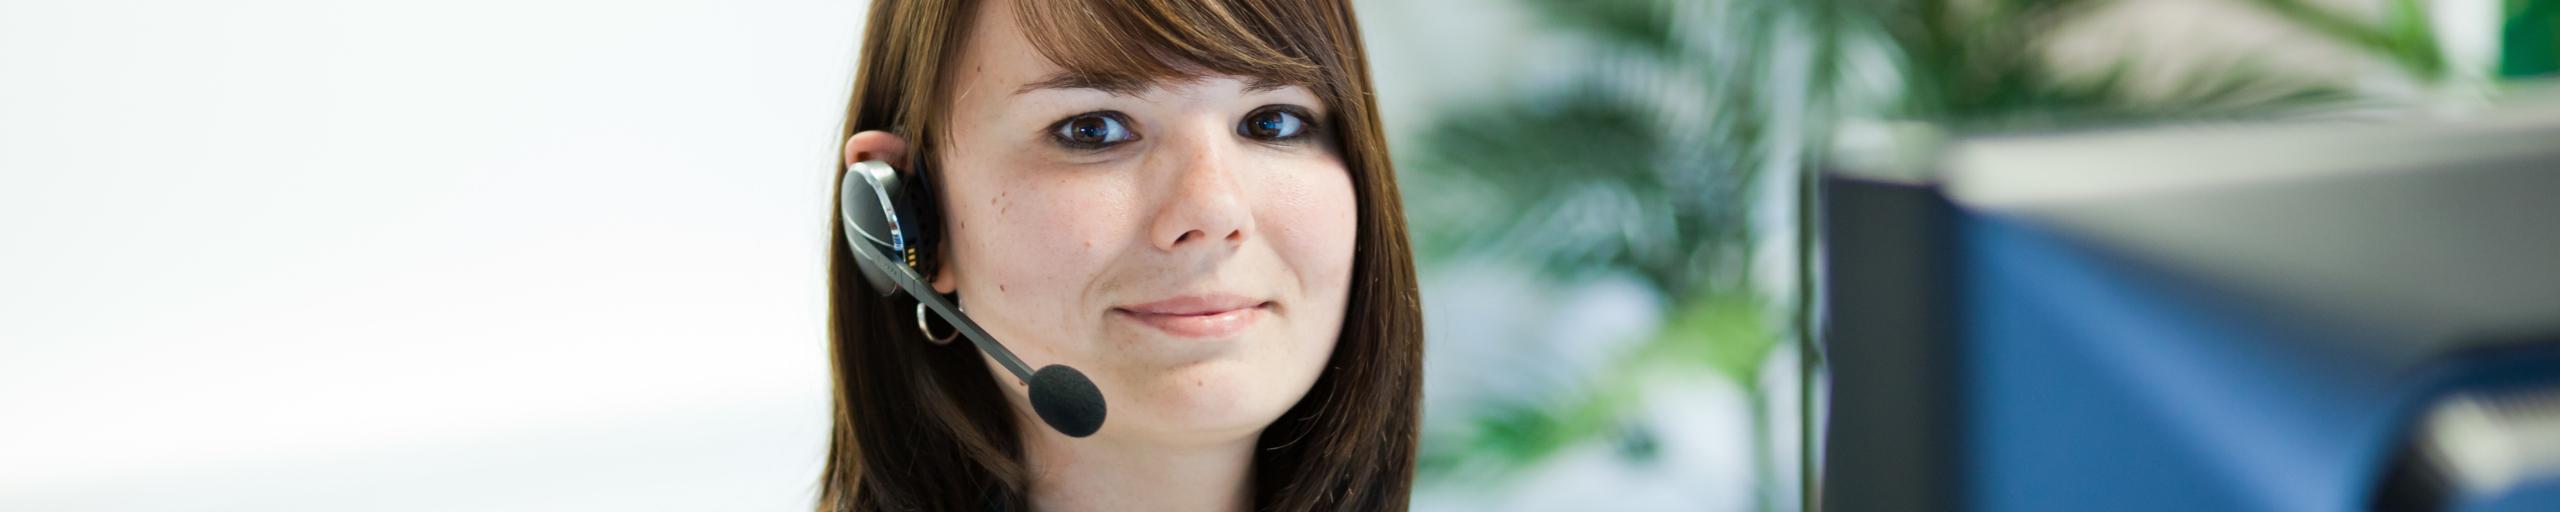 Headerbild Frau mit Headset